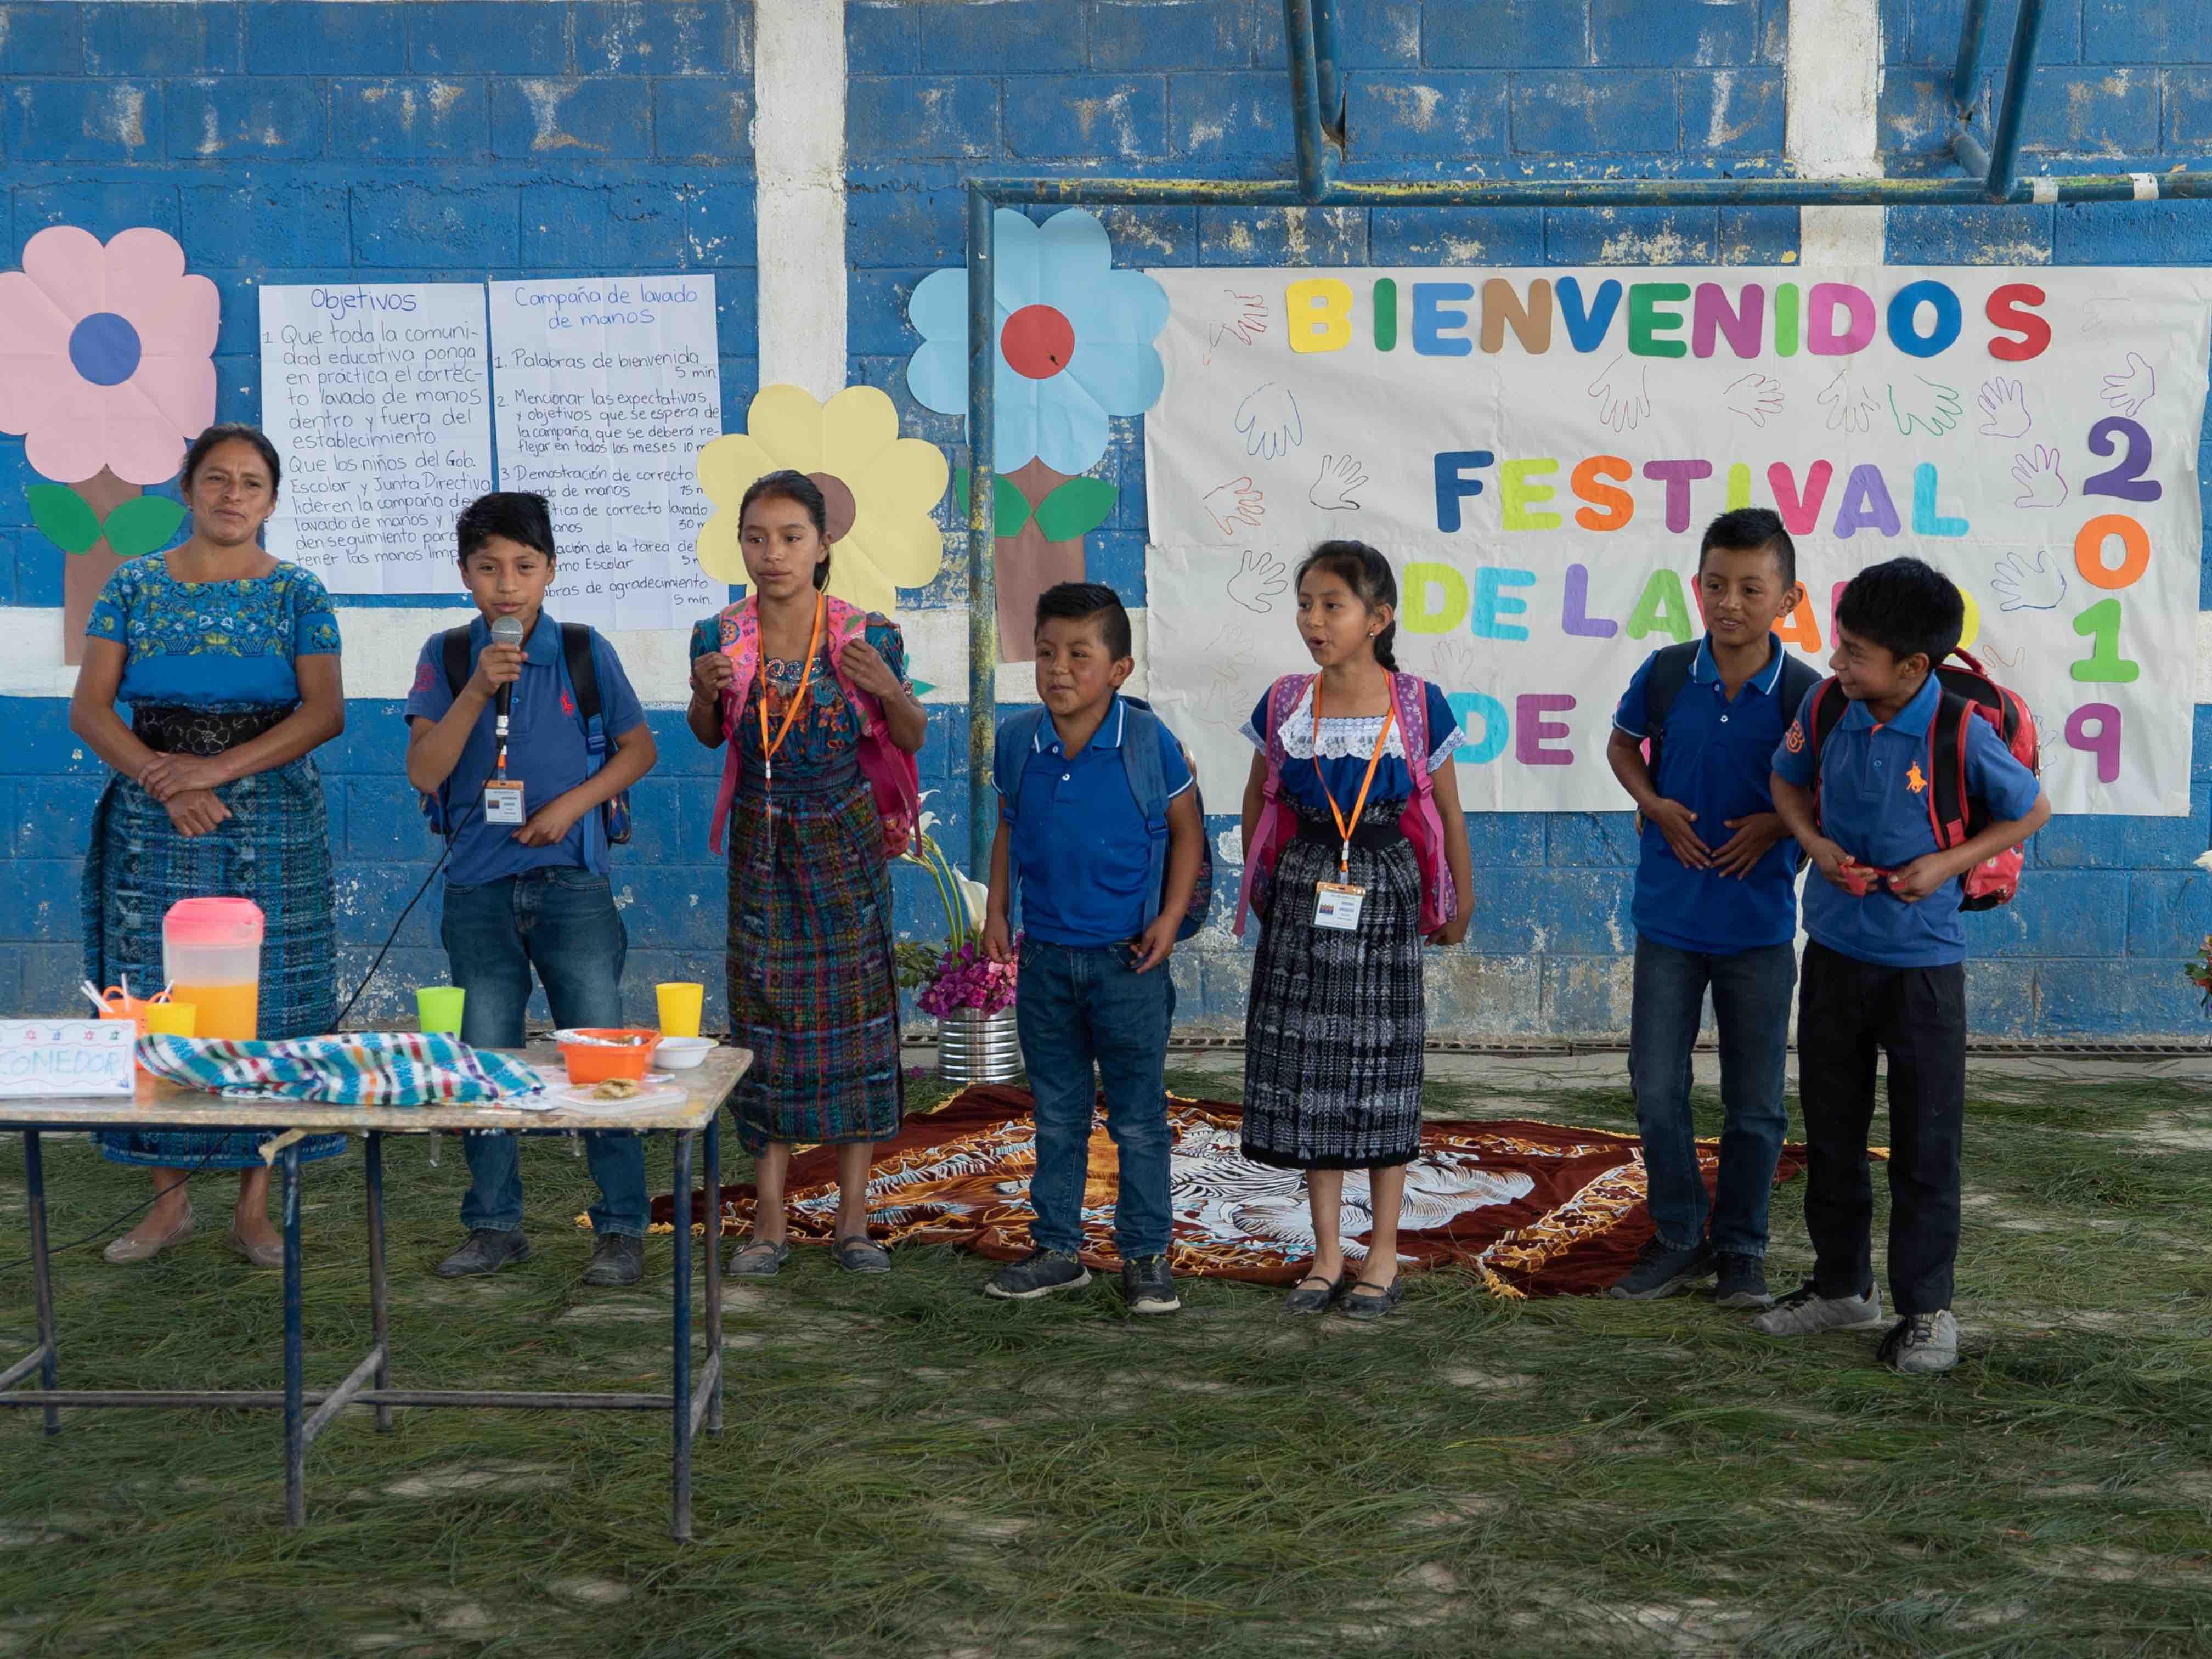 Guatemalan boy speaking into microphone